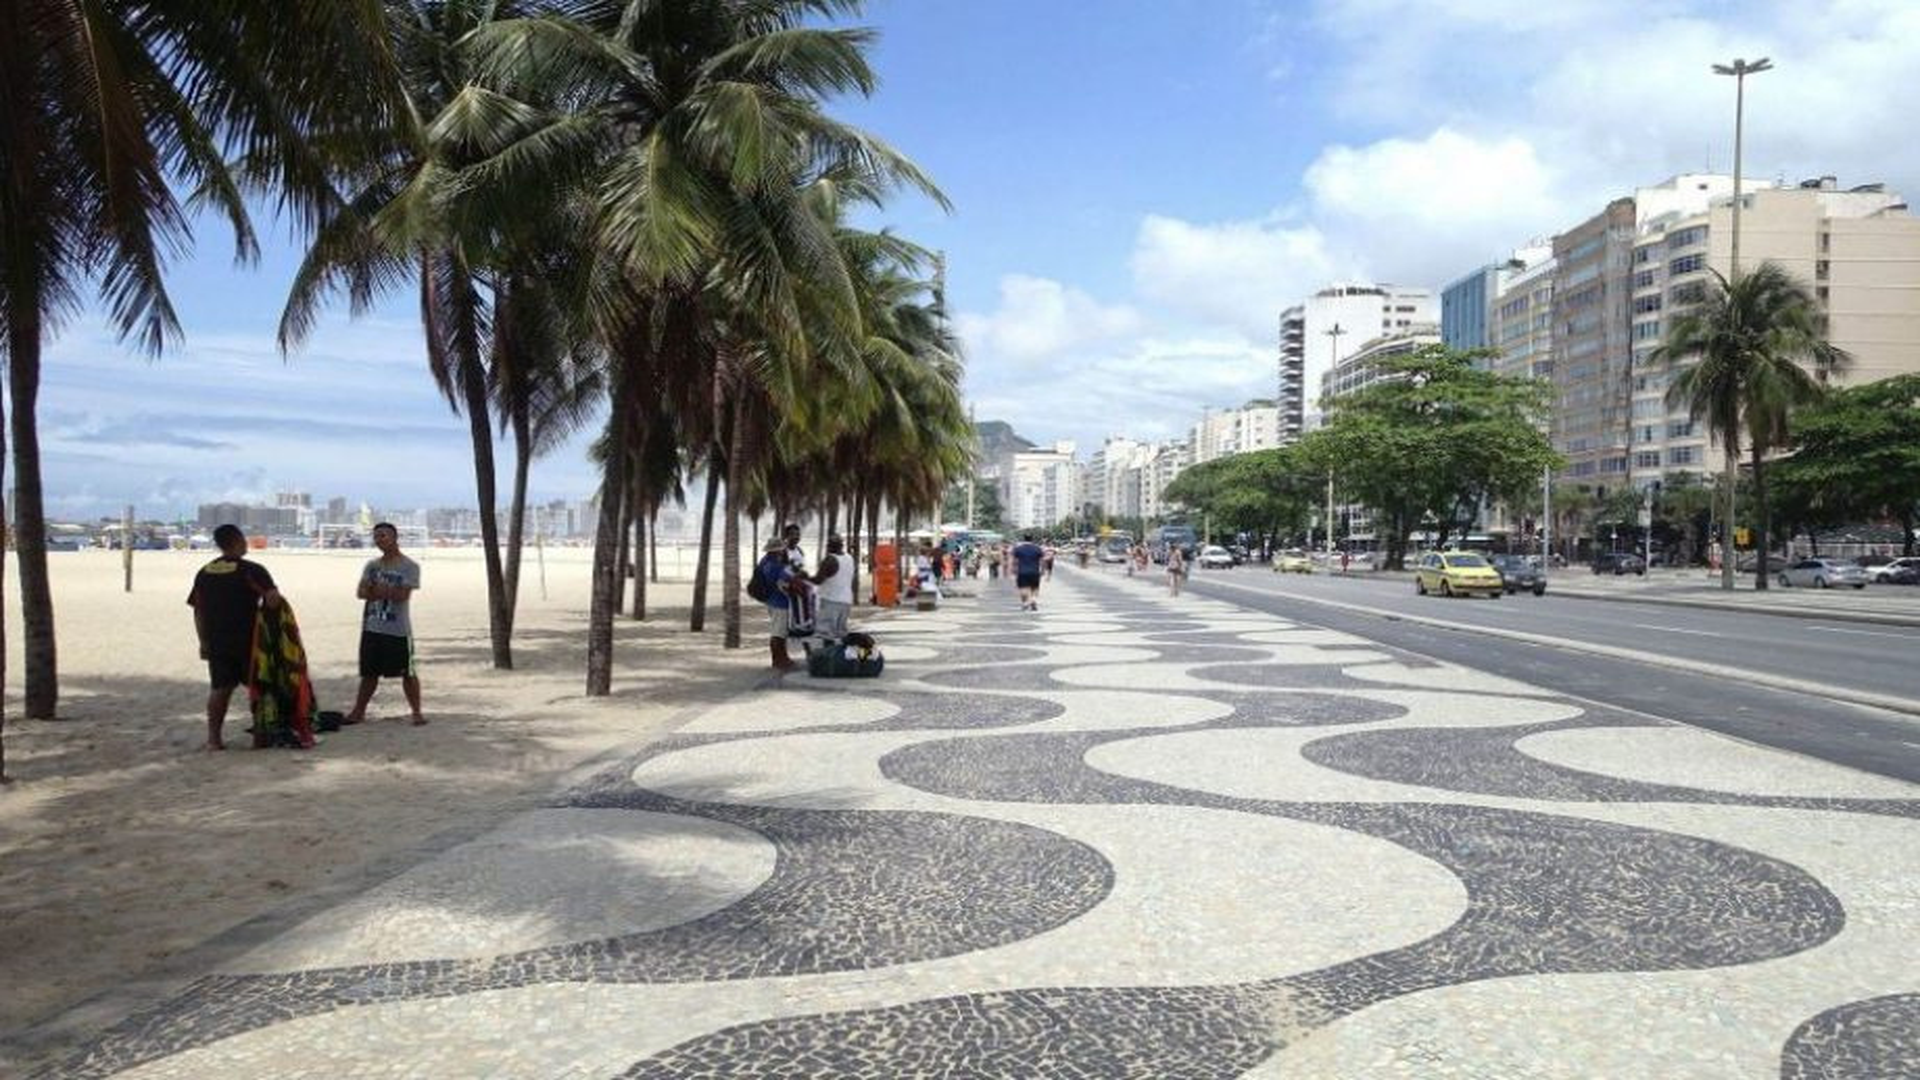 Rio, première capitale mondiale de l'architecture!